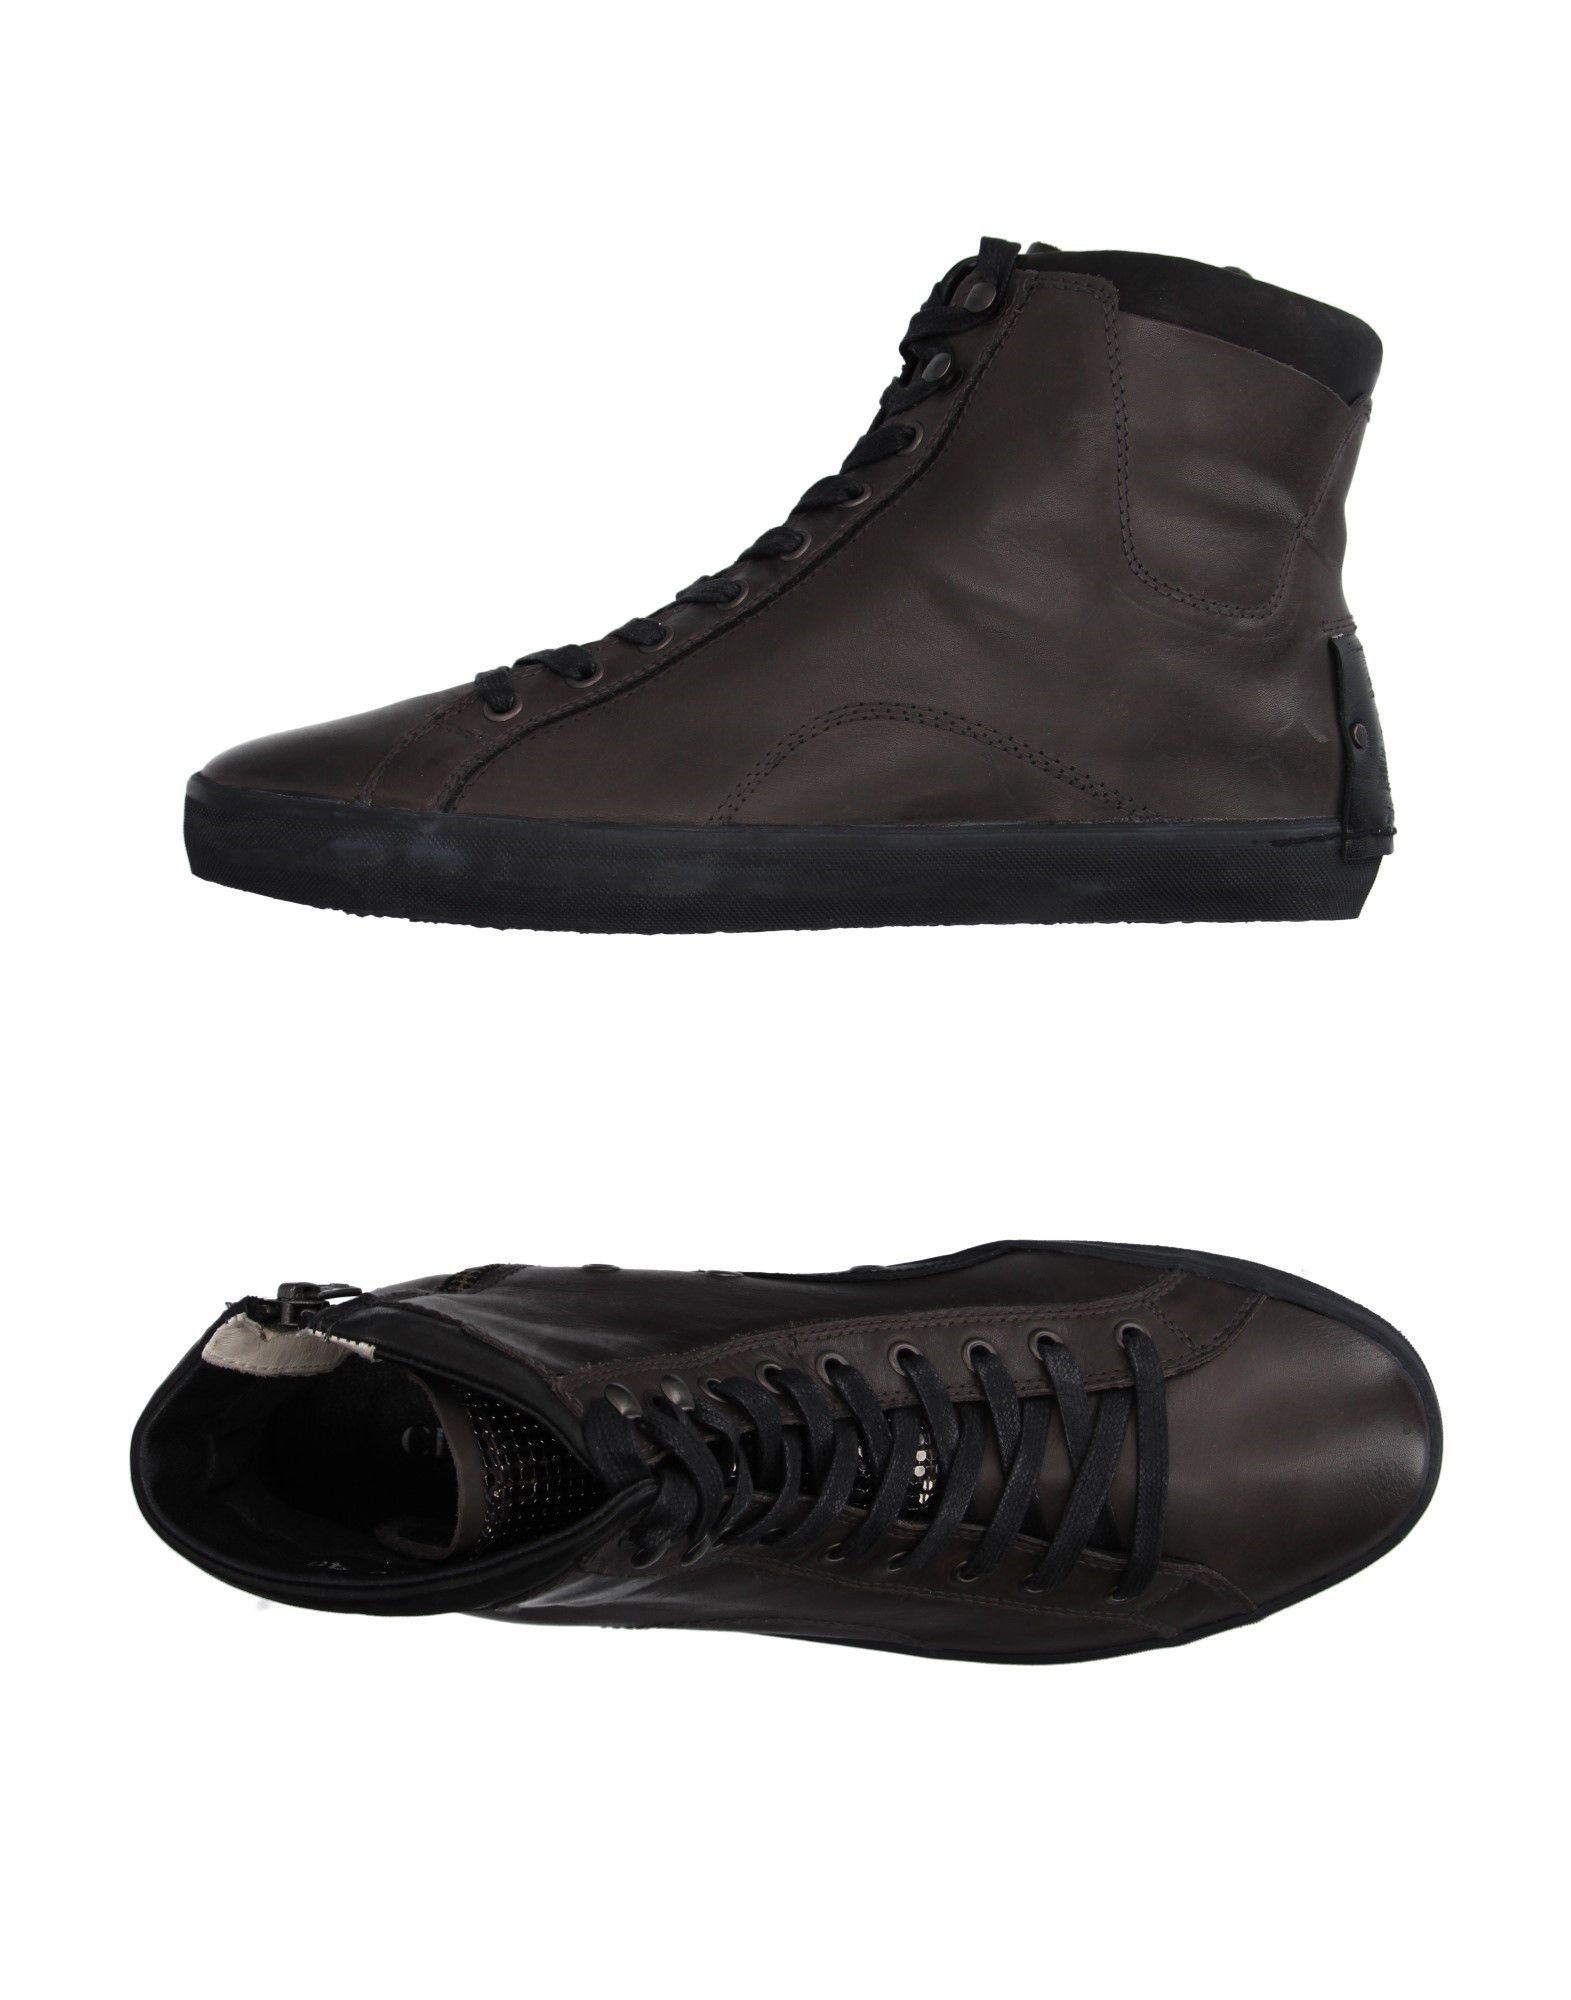 Crime London Gute Sneakers Damen  11143850RN Gute London Qualität beliebte Schuhe 95dded